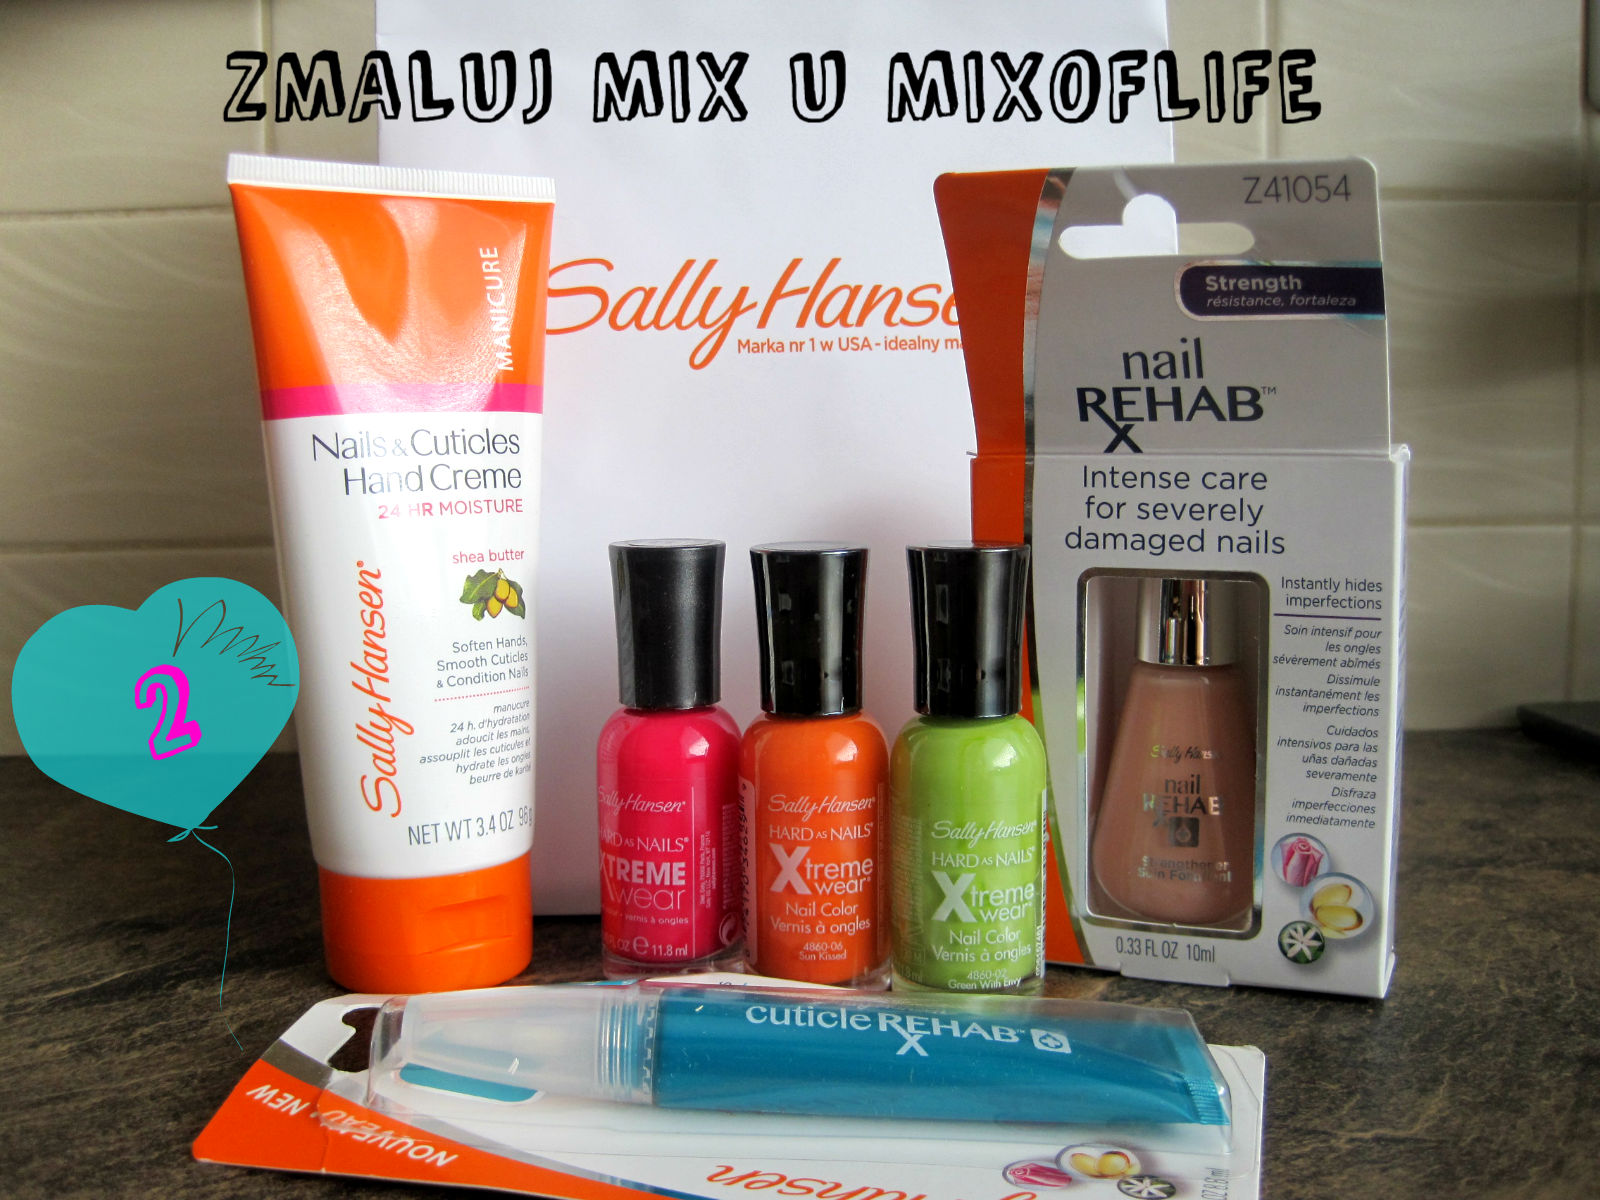 http://mymixoflife.blogspot.com/2014/06/konkurs-2-urodziny-bloga-zmaluj-mix-u.html